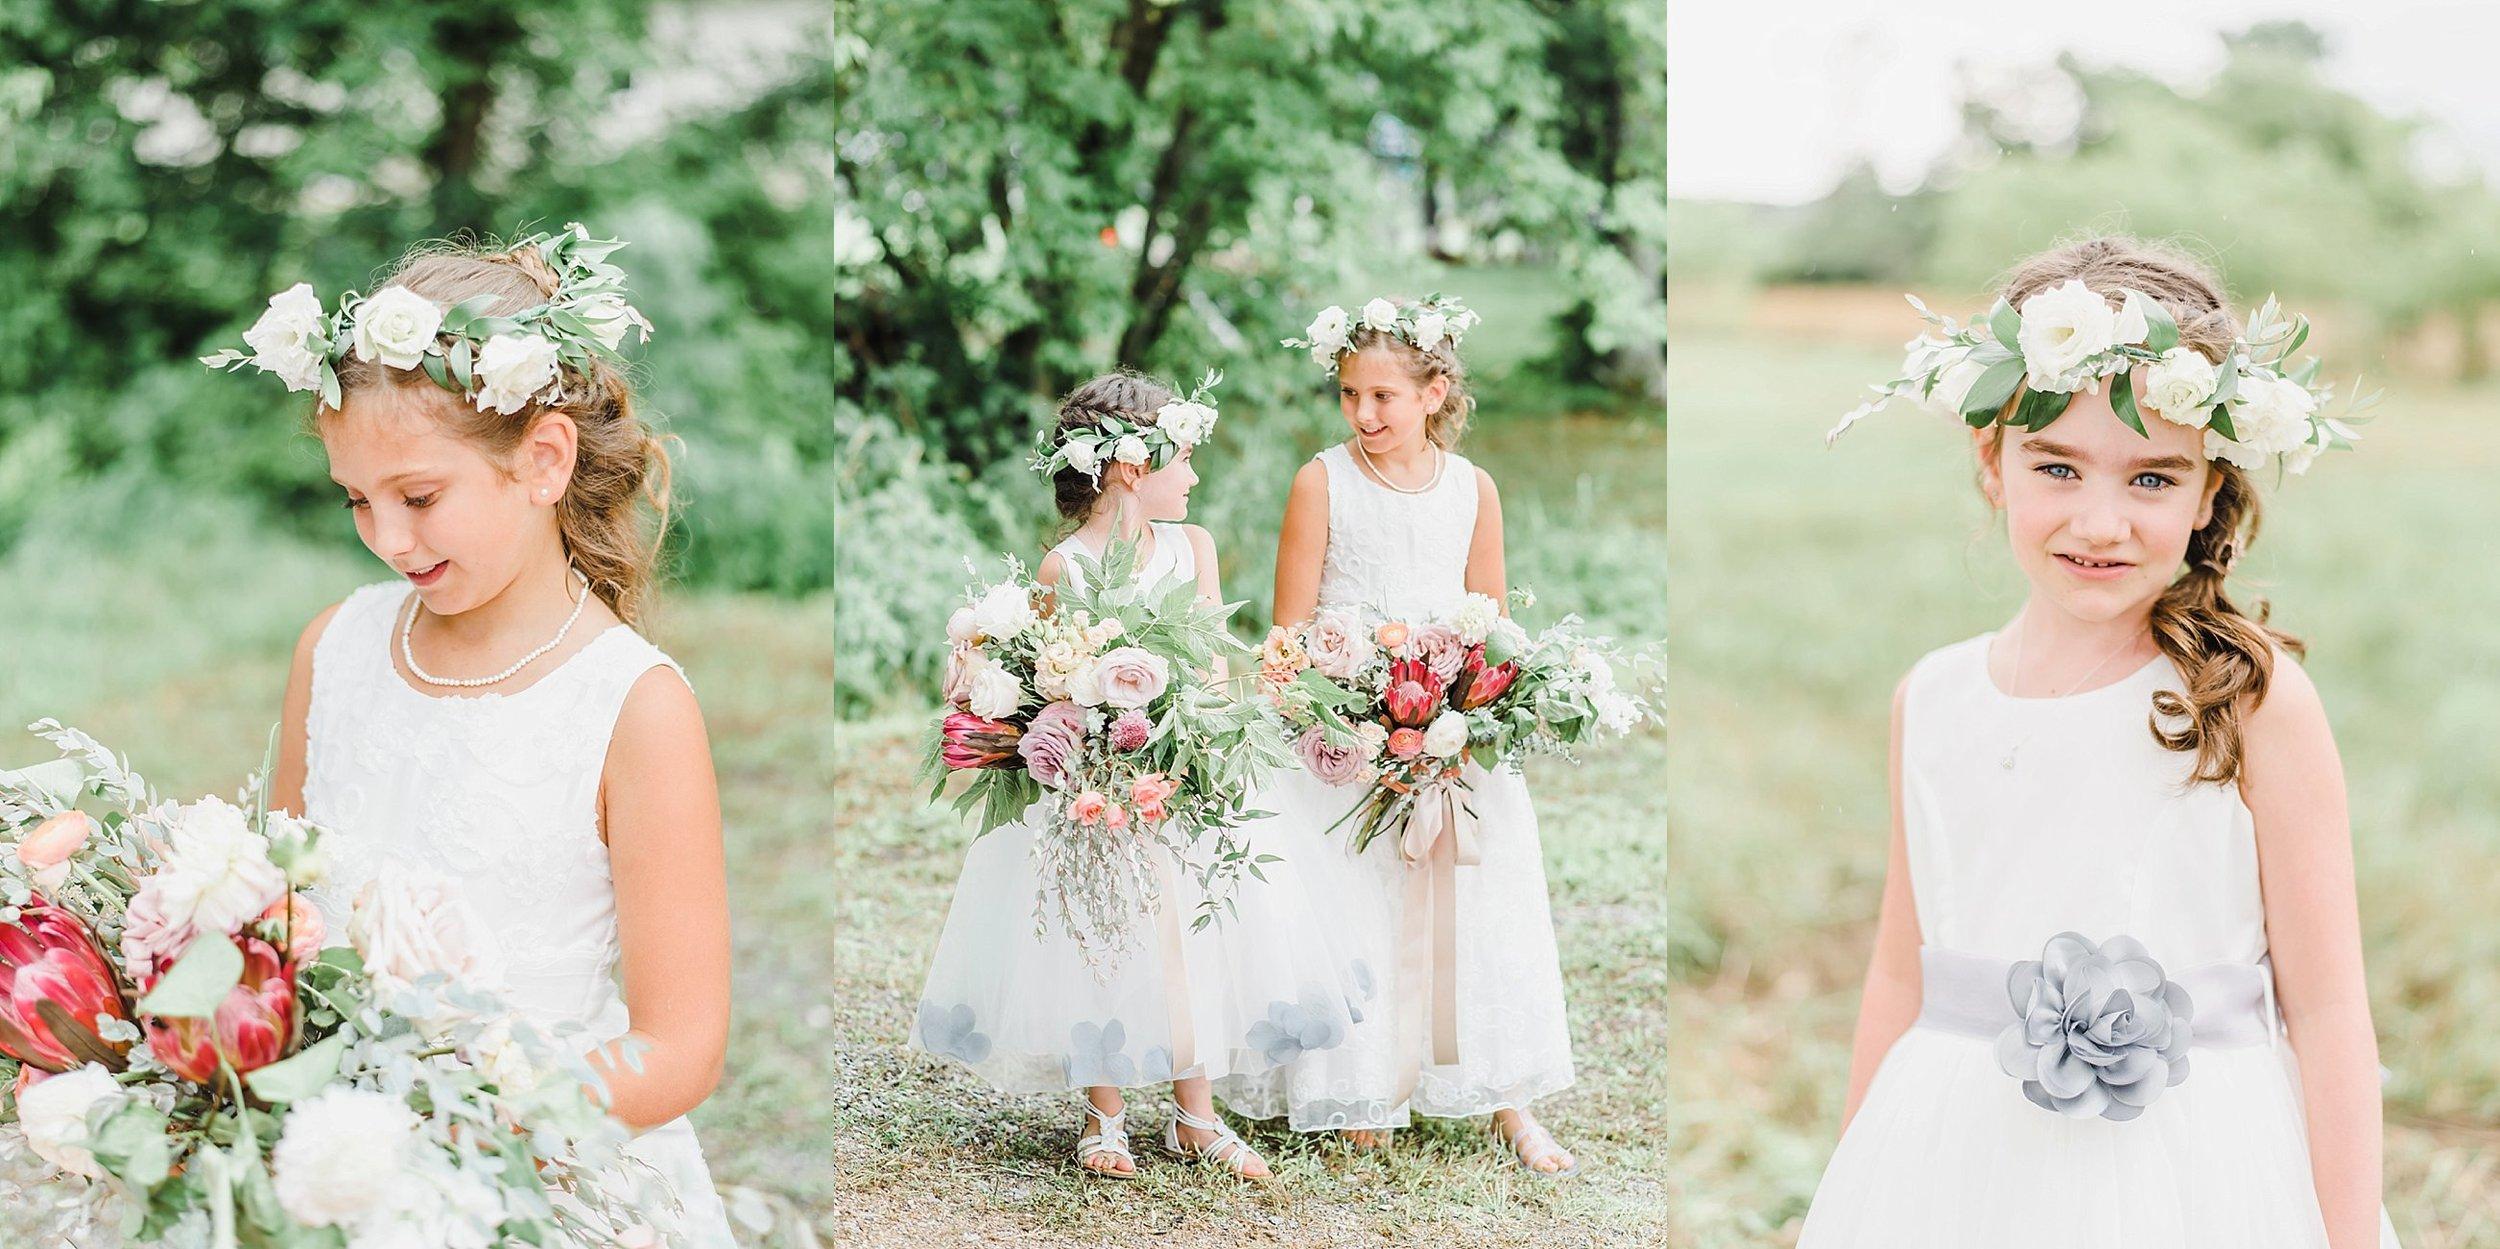 light airy indie fine art ottawa wedding photographer | Ali and Batoul Photography_0423.jpg